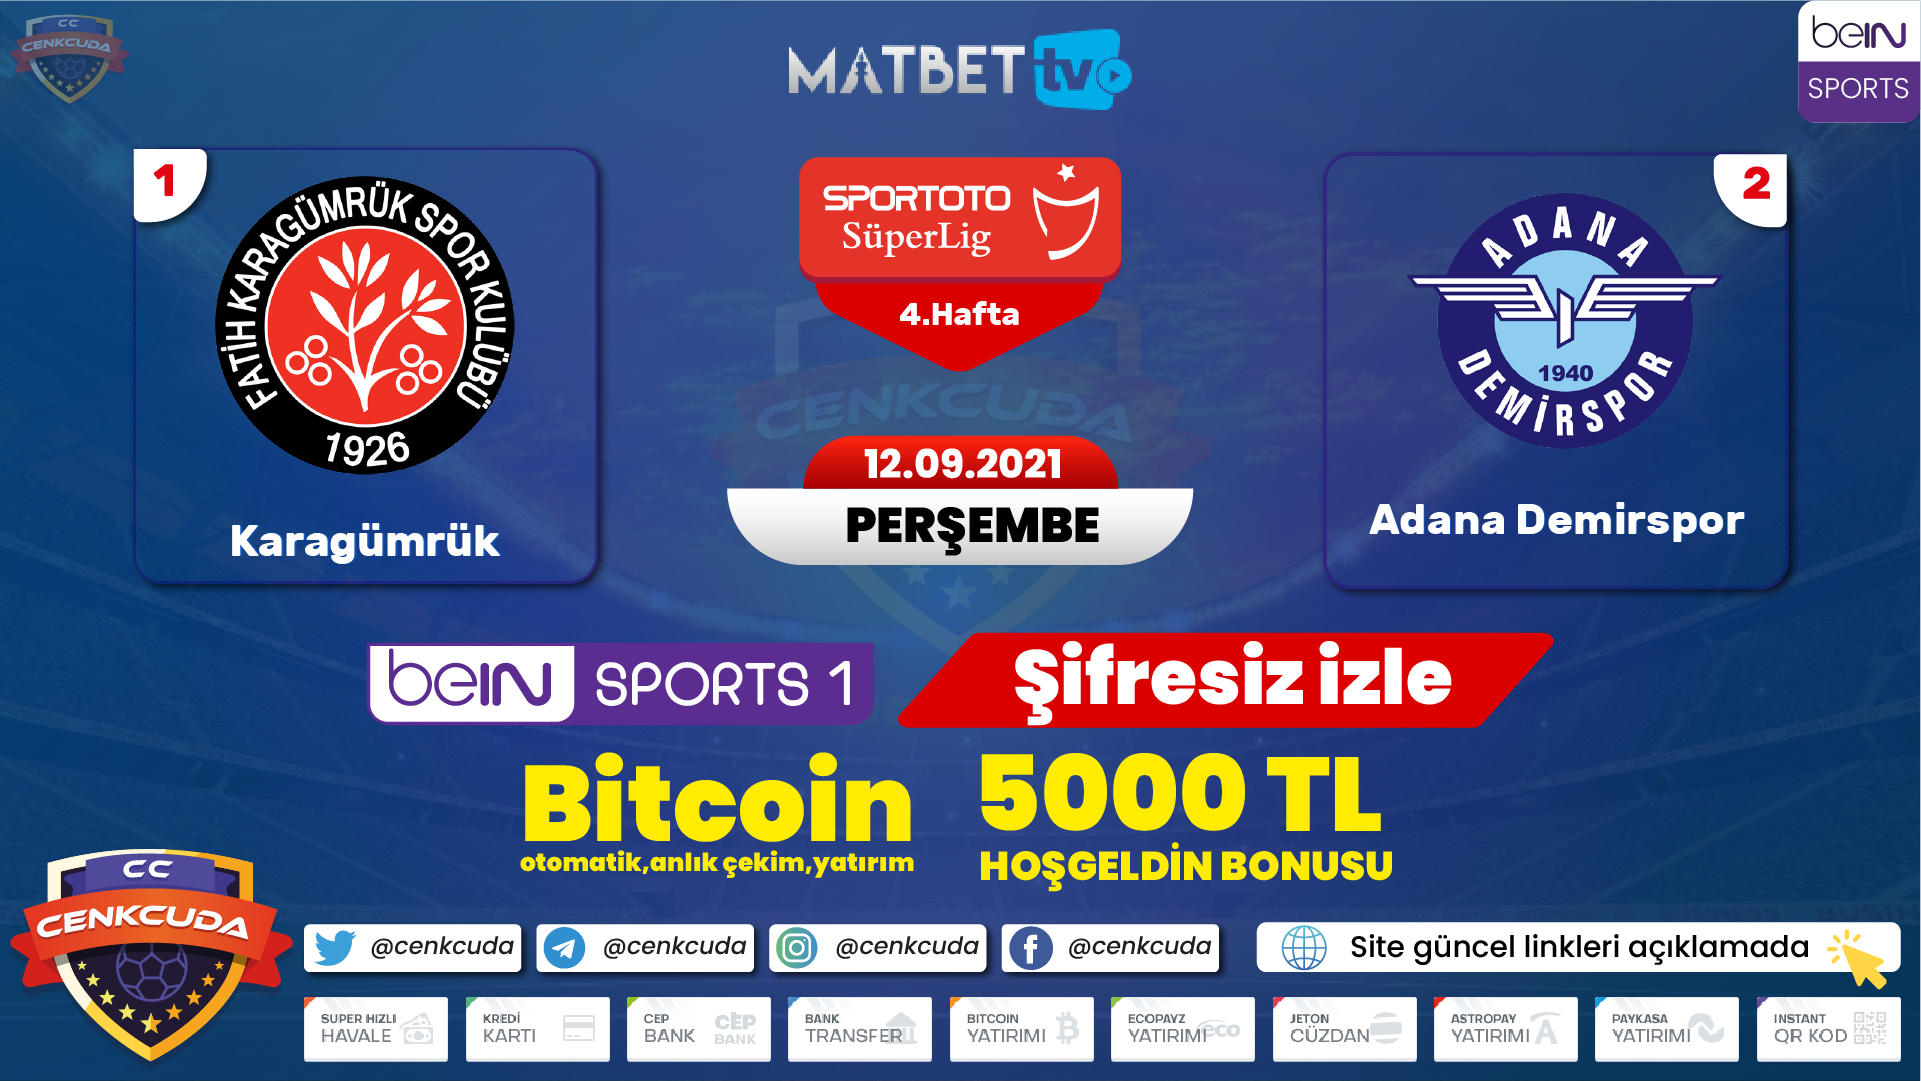 Fatih Karagümrük Adana Demirspor